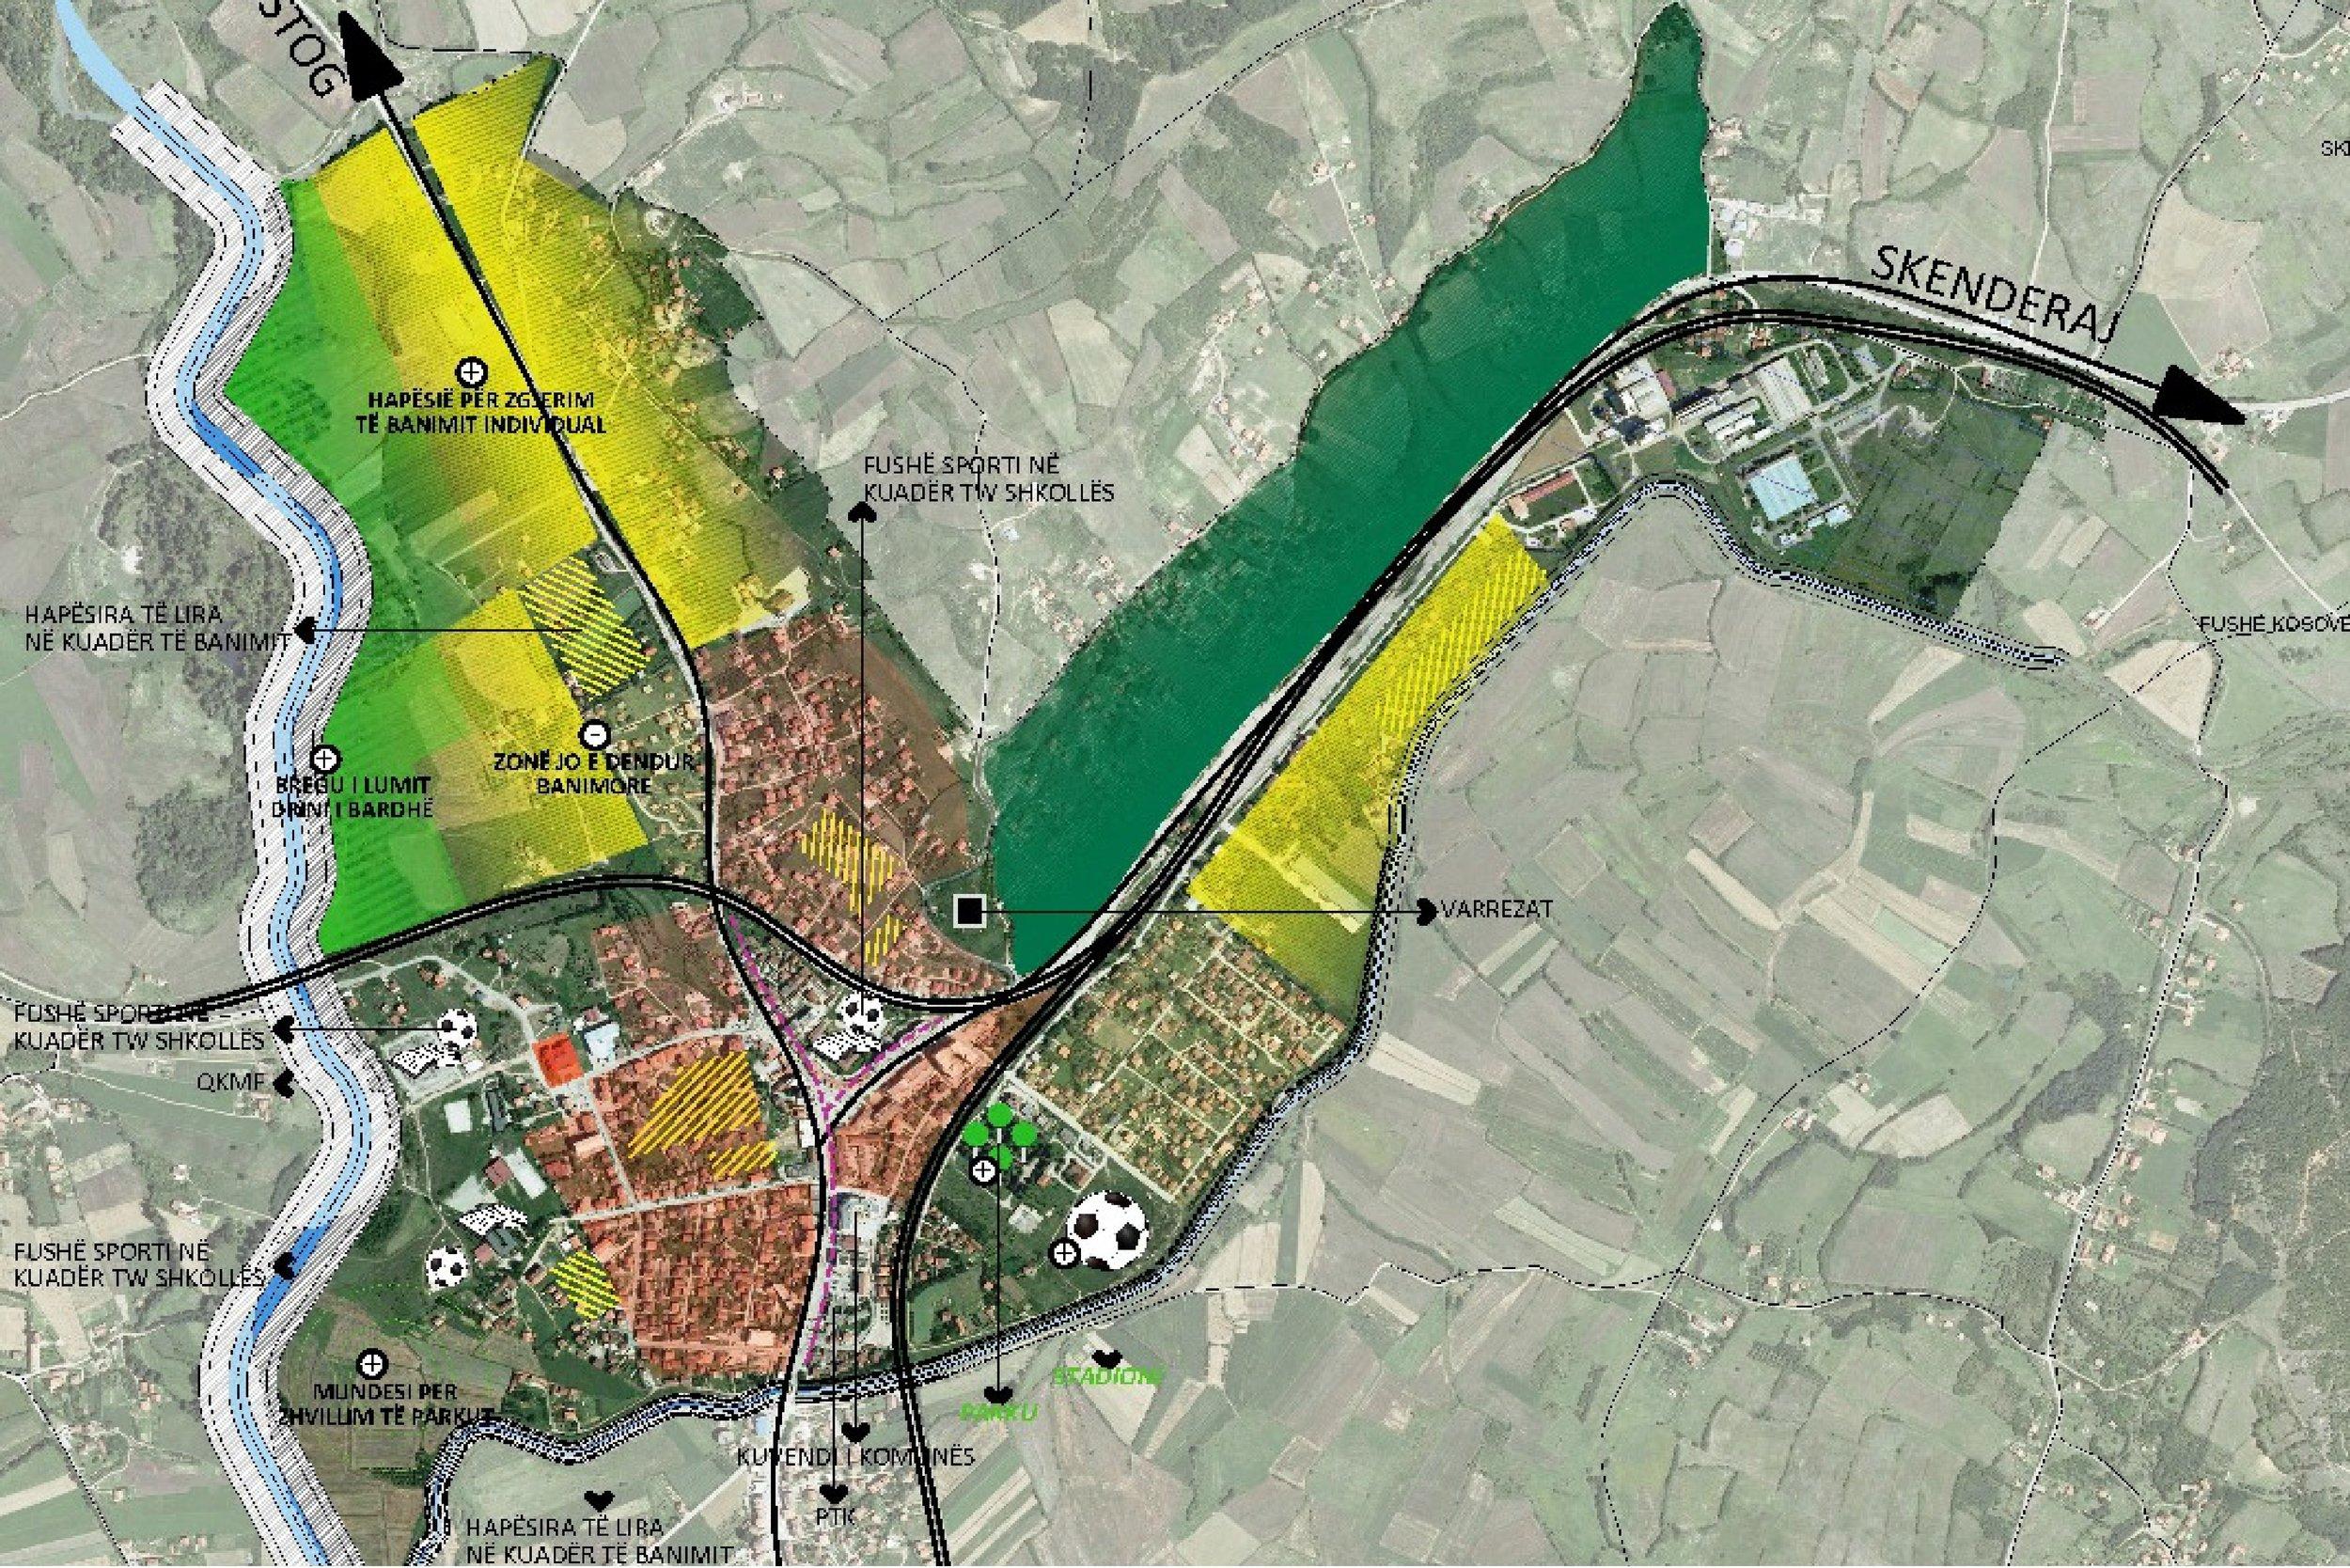 klina - Year: 2015Location: Klina, KosovoClient: Municipality of KlinaUrban Regulatory Plan